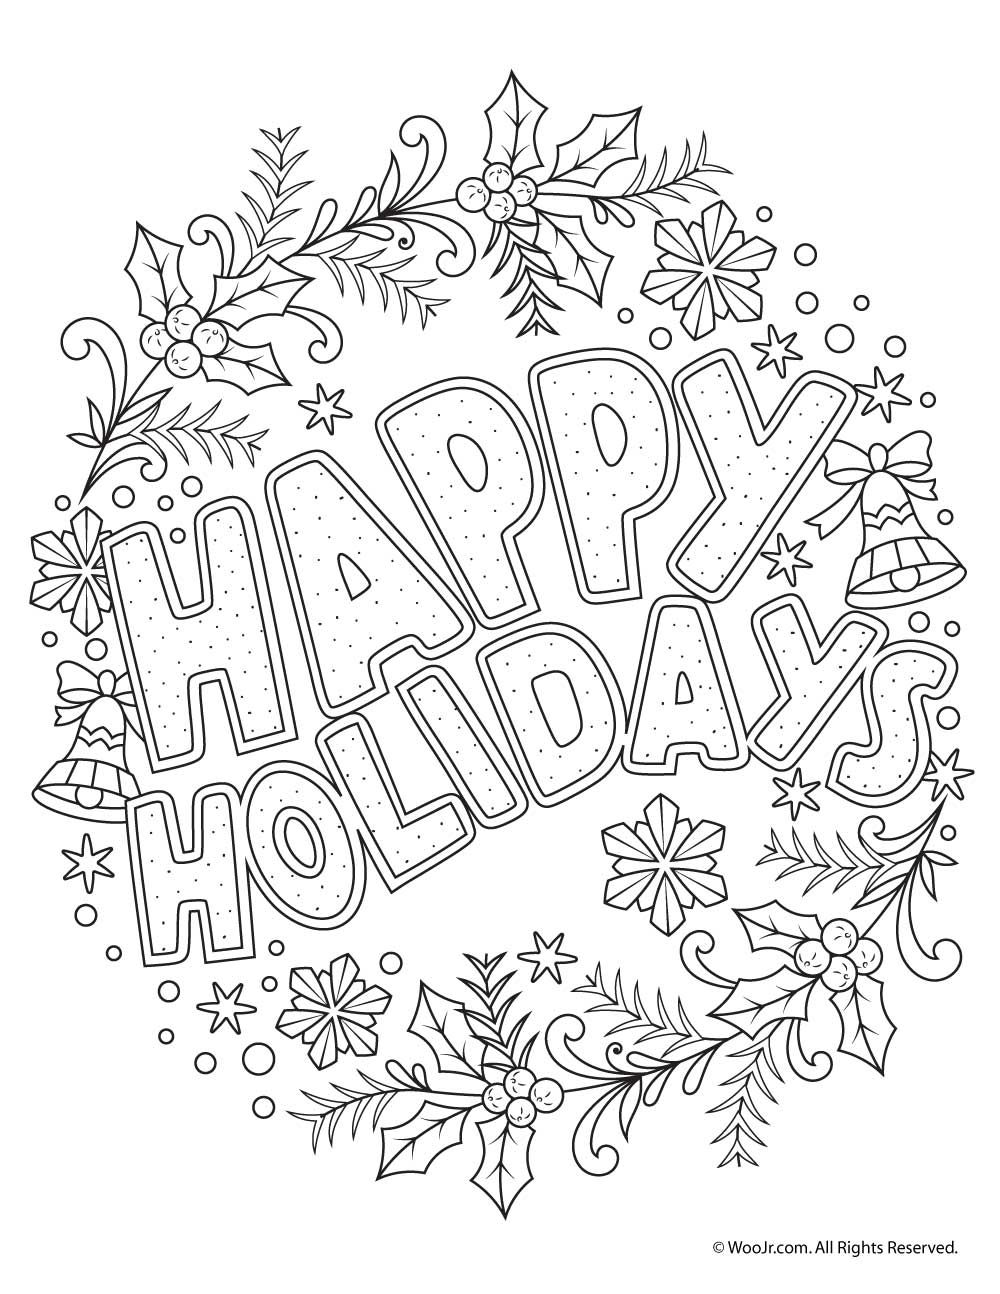 Beautiful Printable Christmas Adult Coloring Pages ...   free printable christmas coloring pages for adults